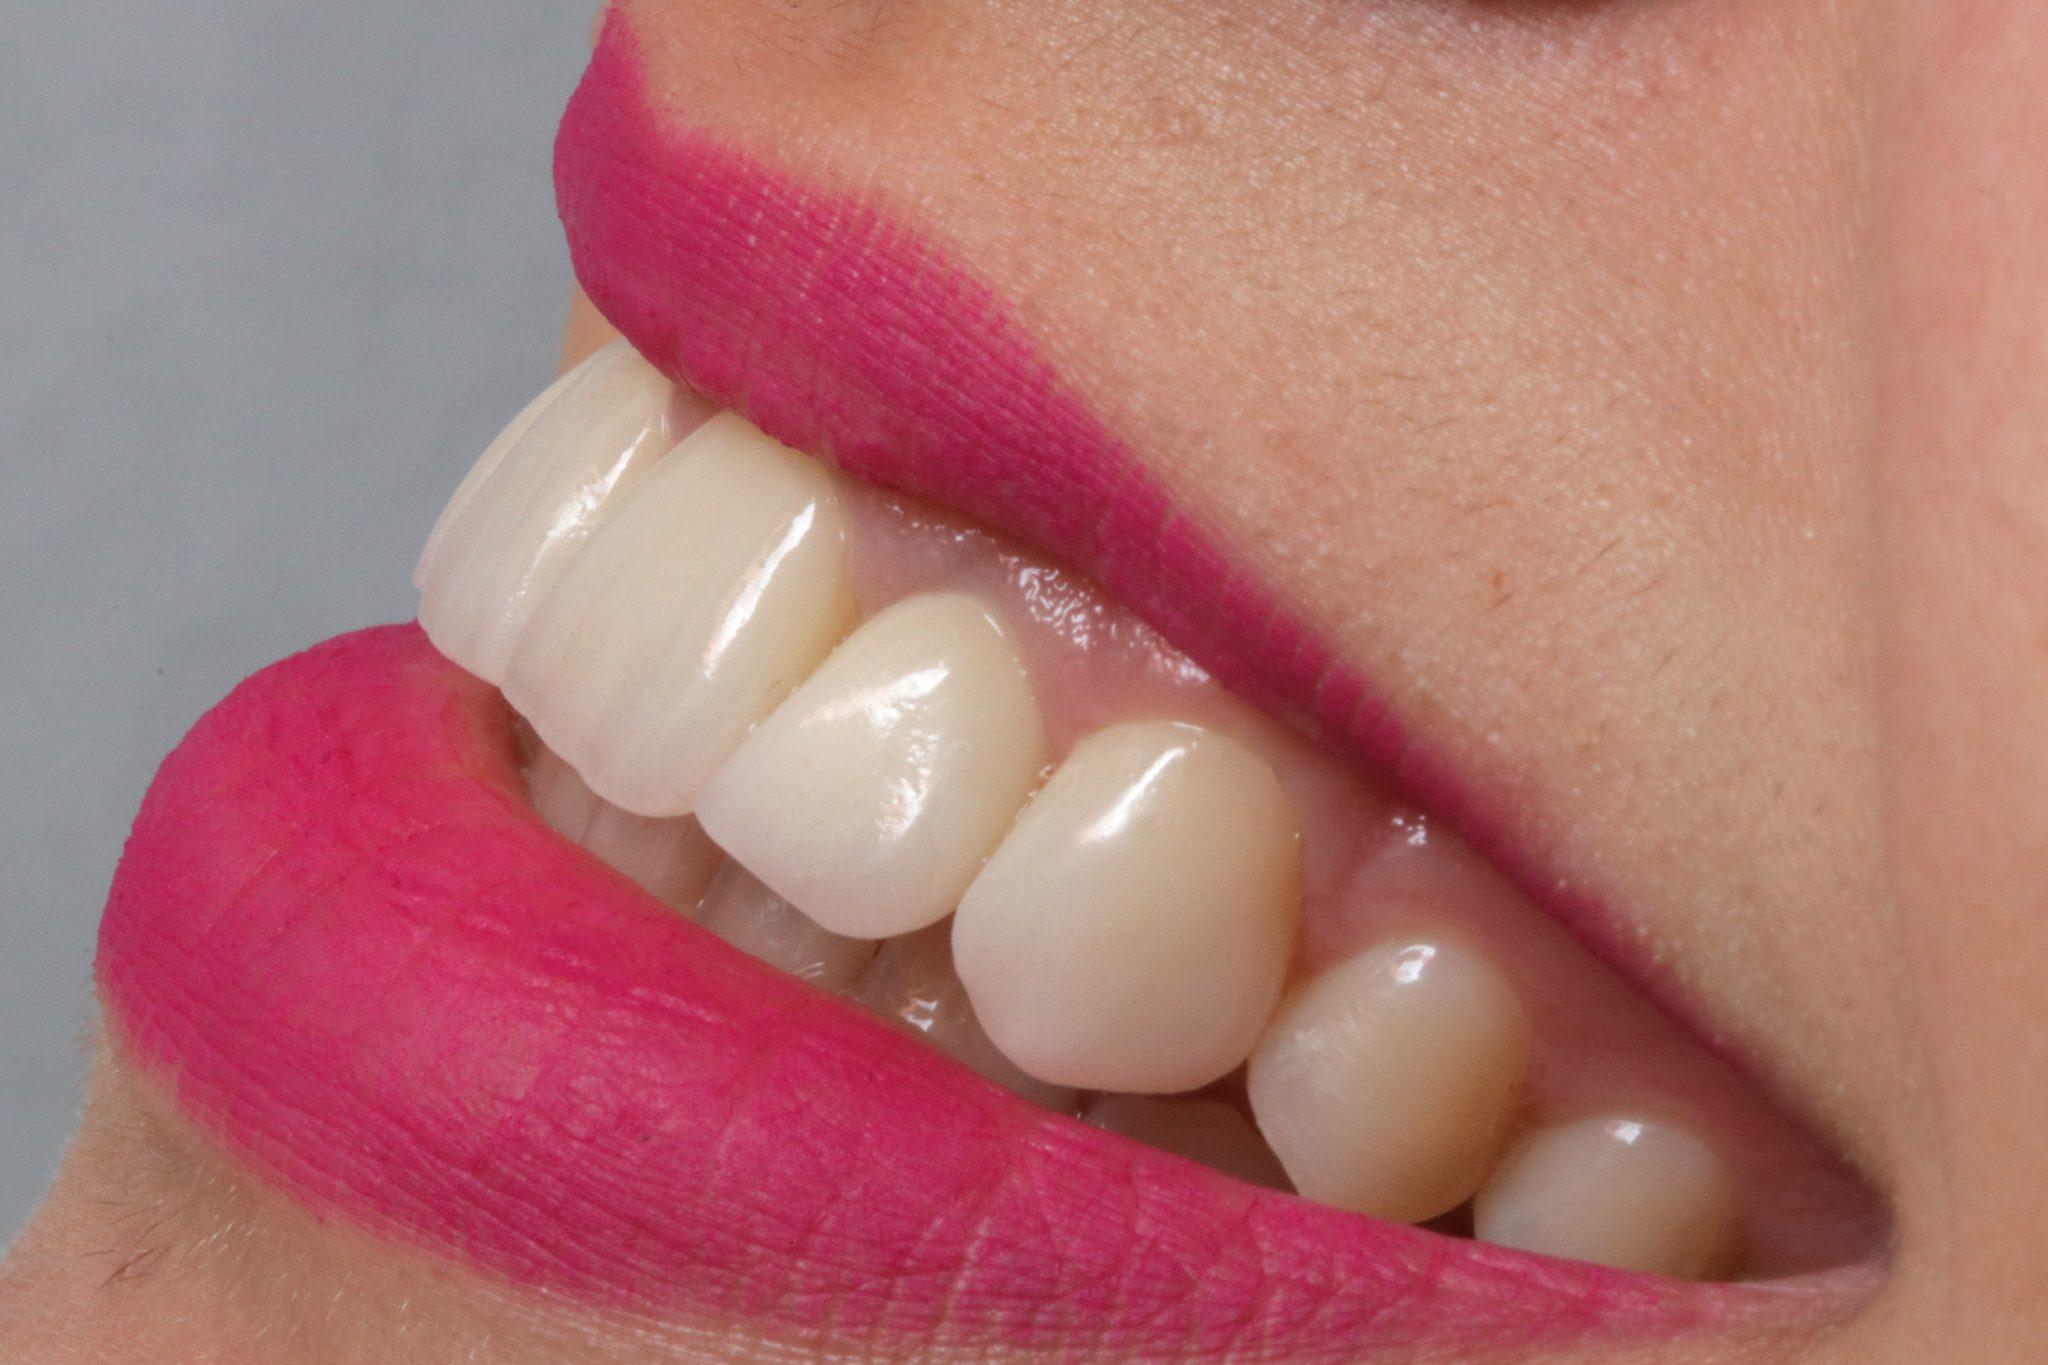 Lente-de-contato-dental-instituto-kopp